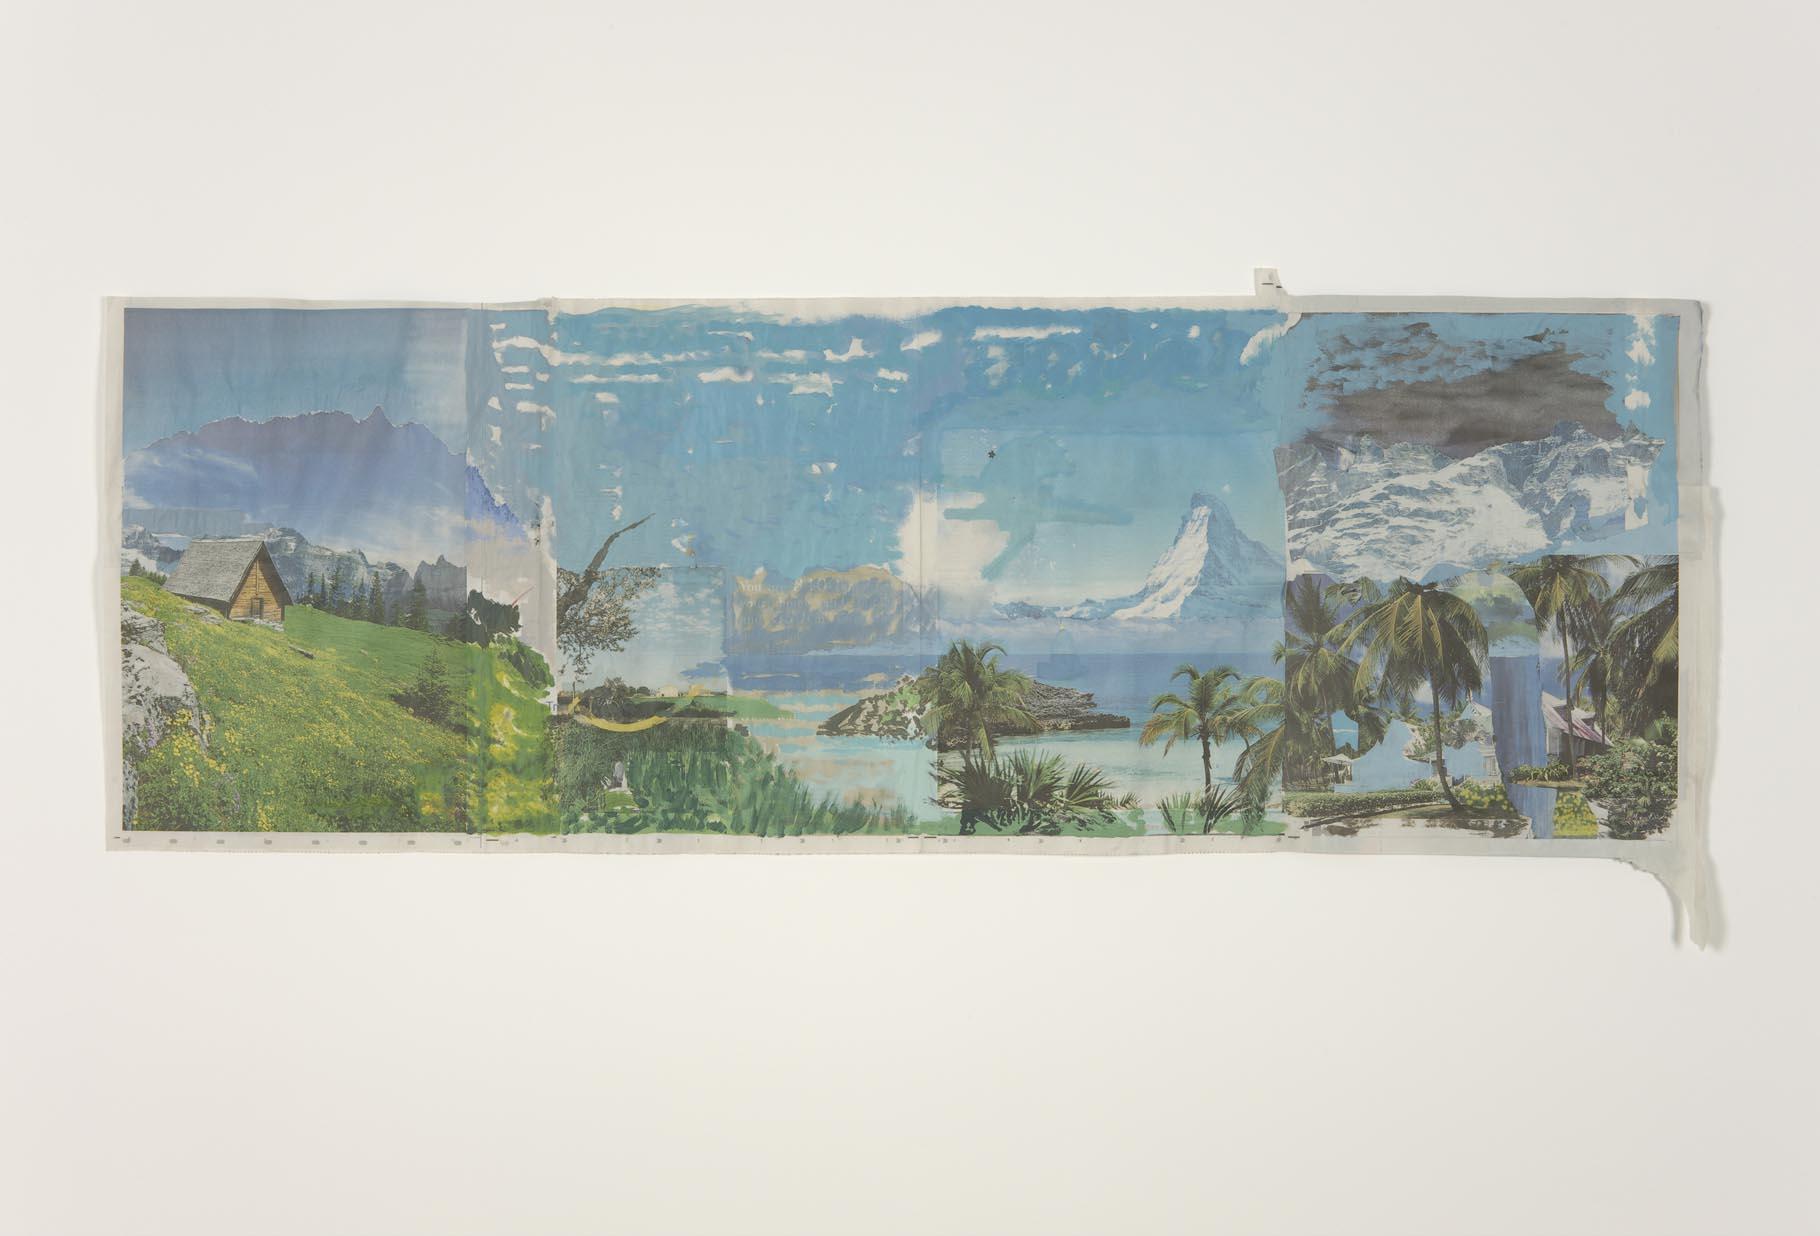 Five die cutting star   2012   Acrylic on newsprint   54.5 x 131 cm / 21.4 x 51.5 in